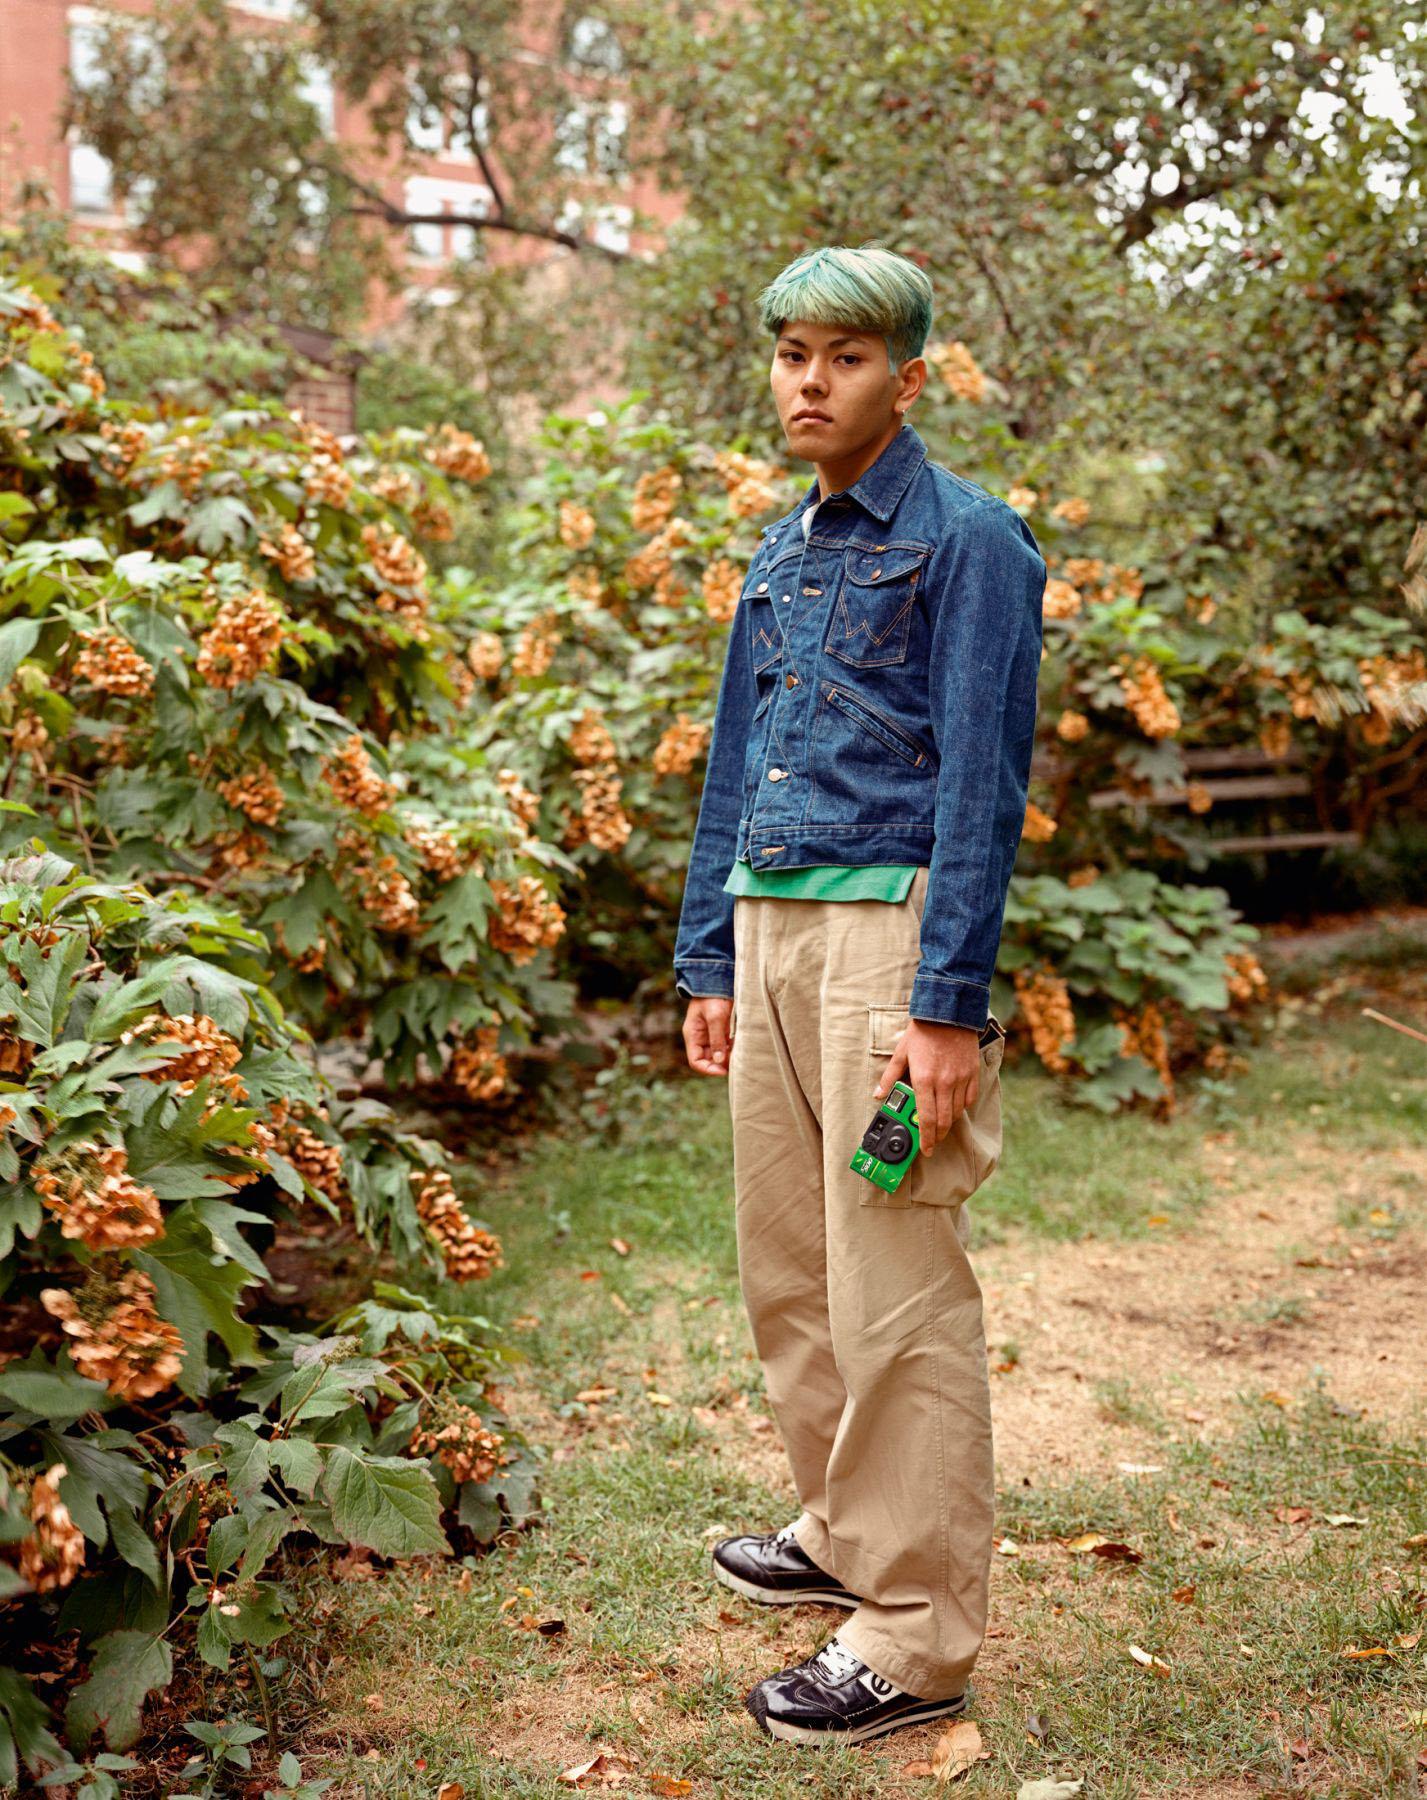 A Tourist in Greenwich Village, New York, New York, October 1994